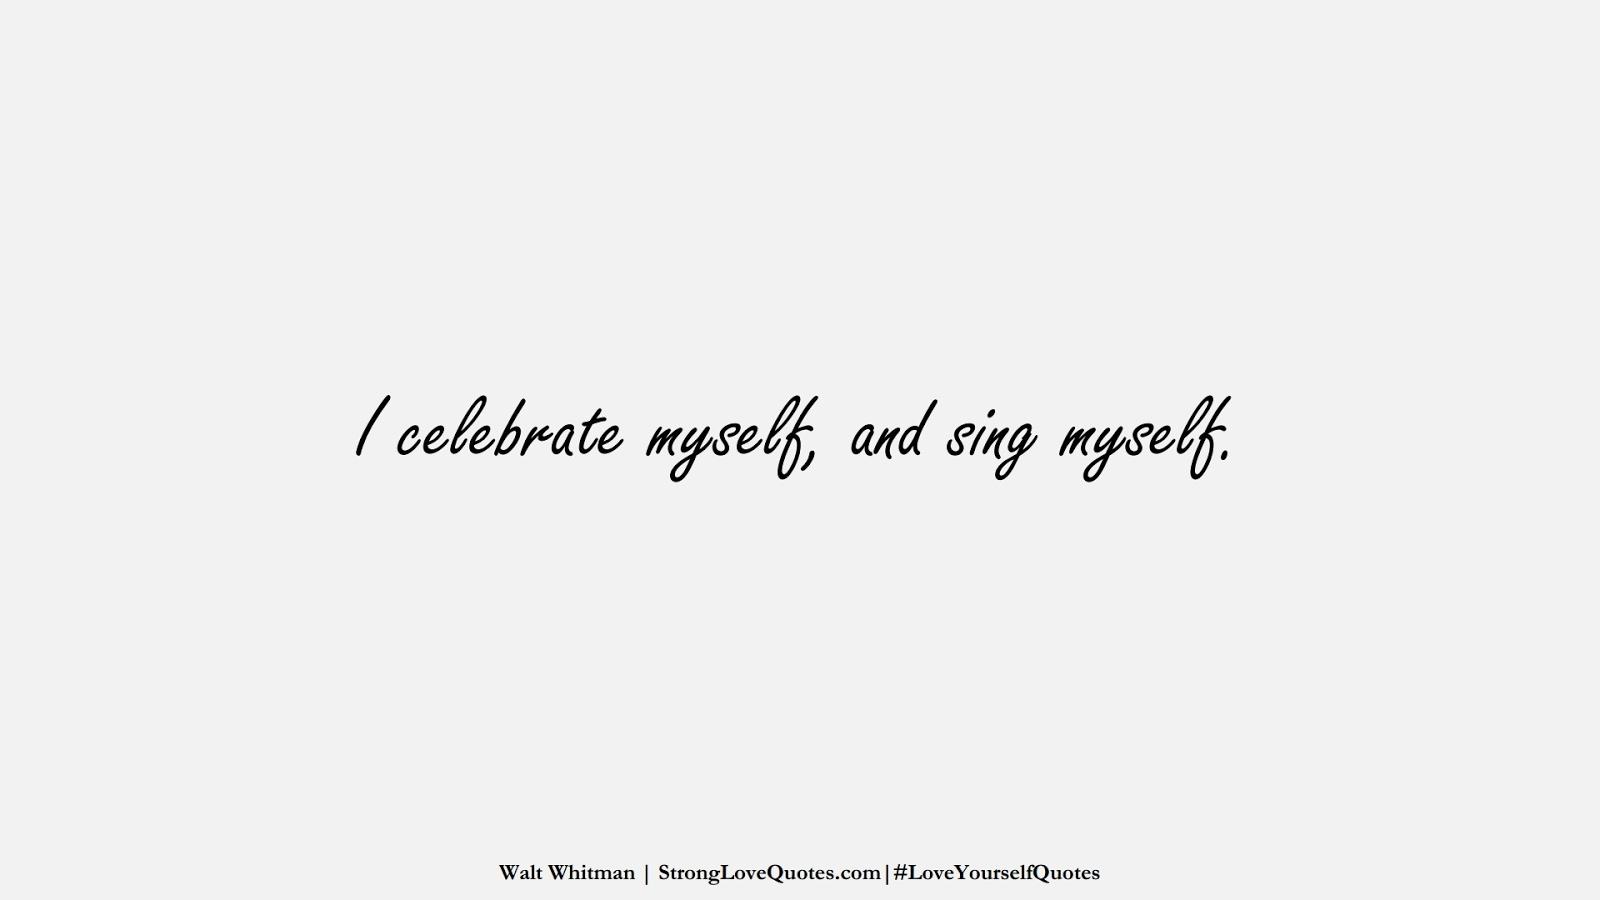 I celebrate myself, and sing myself. (Walt Whitman);  #LoveYourselfQuotes